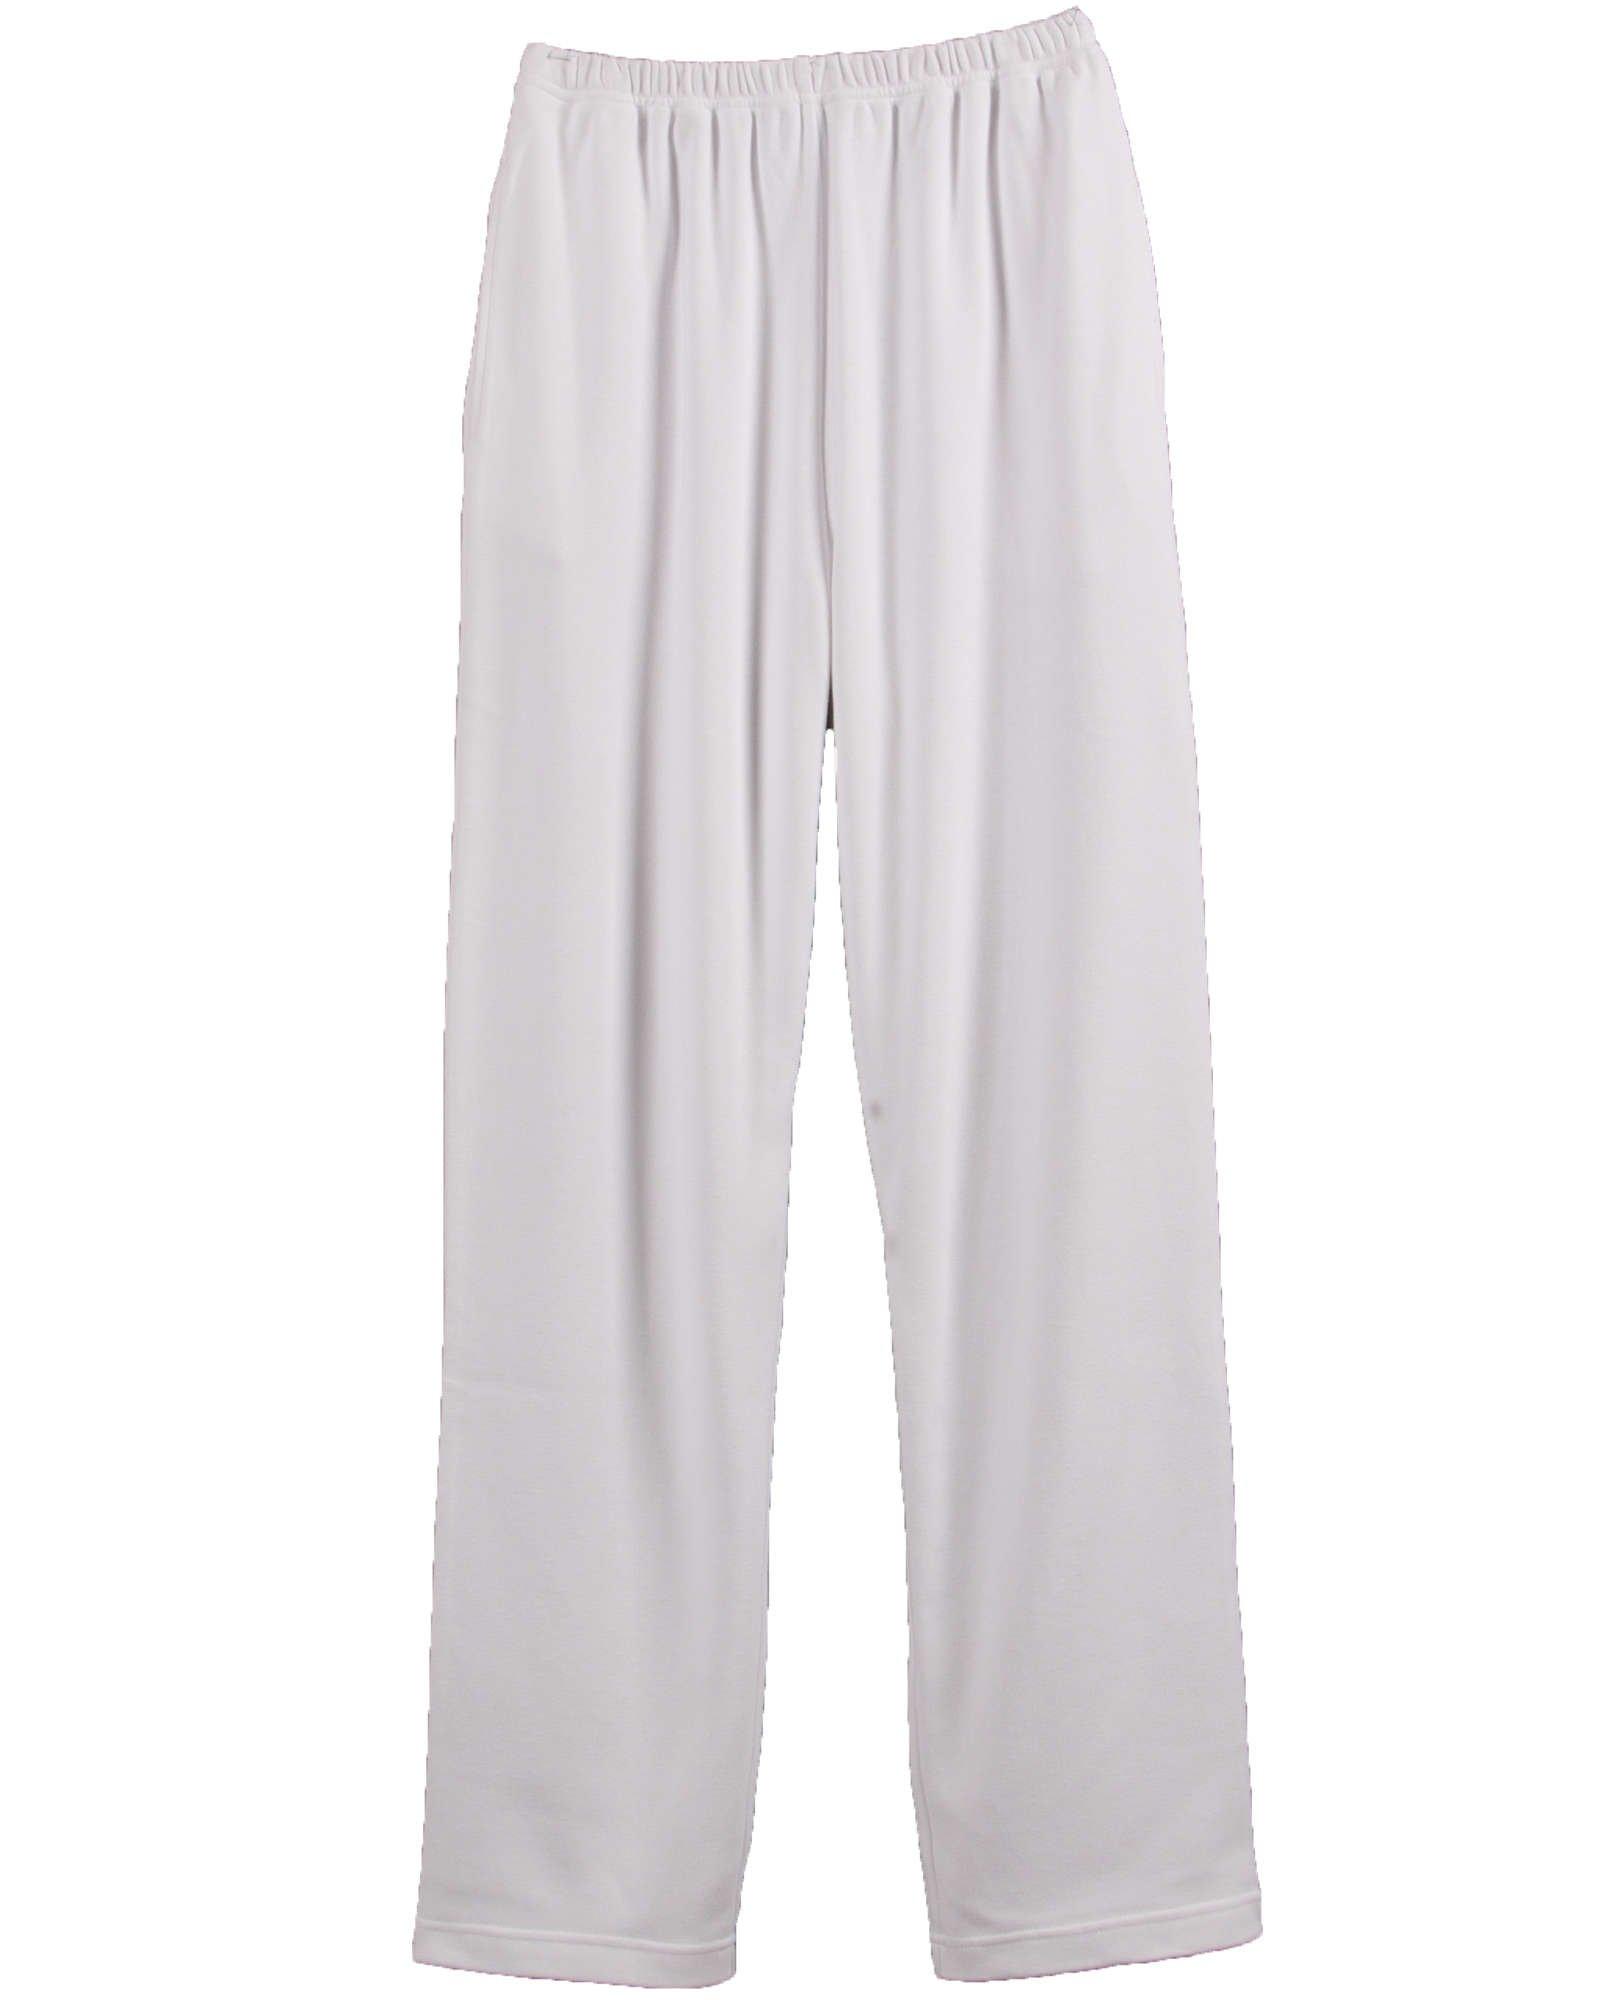 UltraSofts Elastic-Waist Interlock Pull-On Pants, White, Small